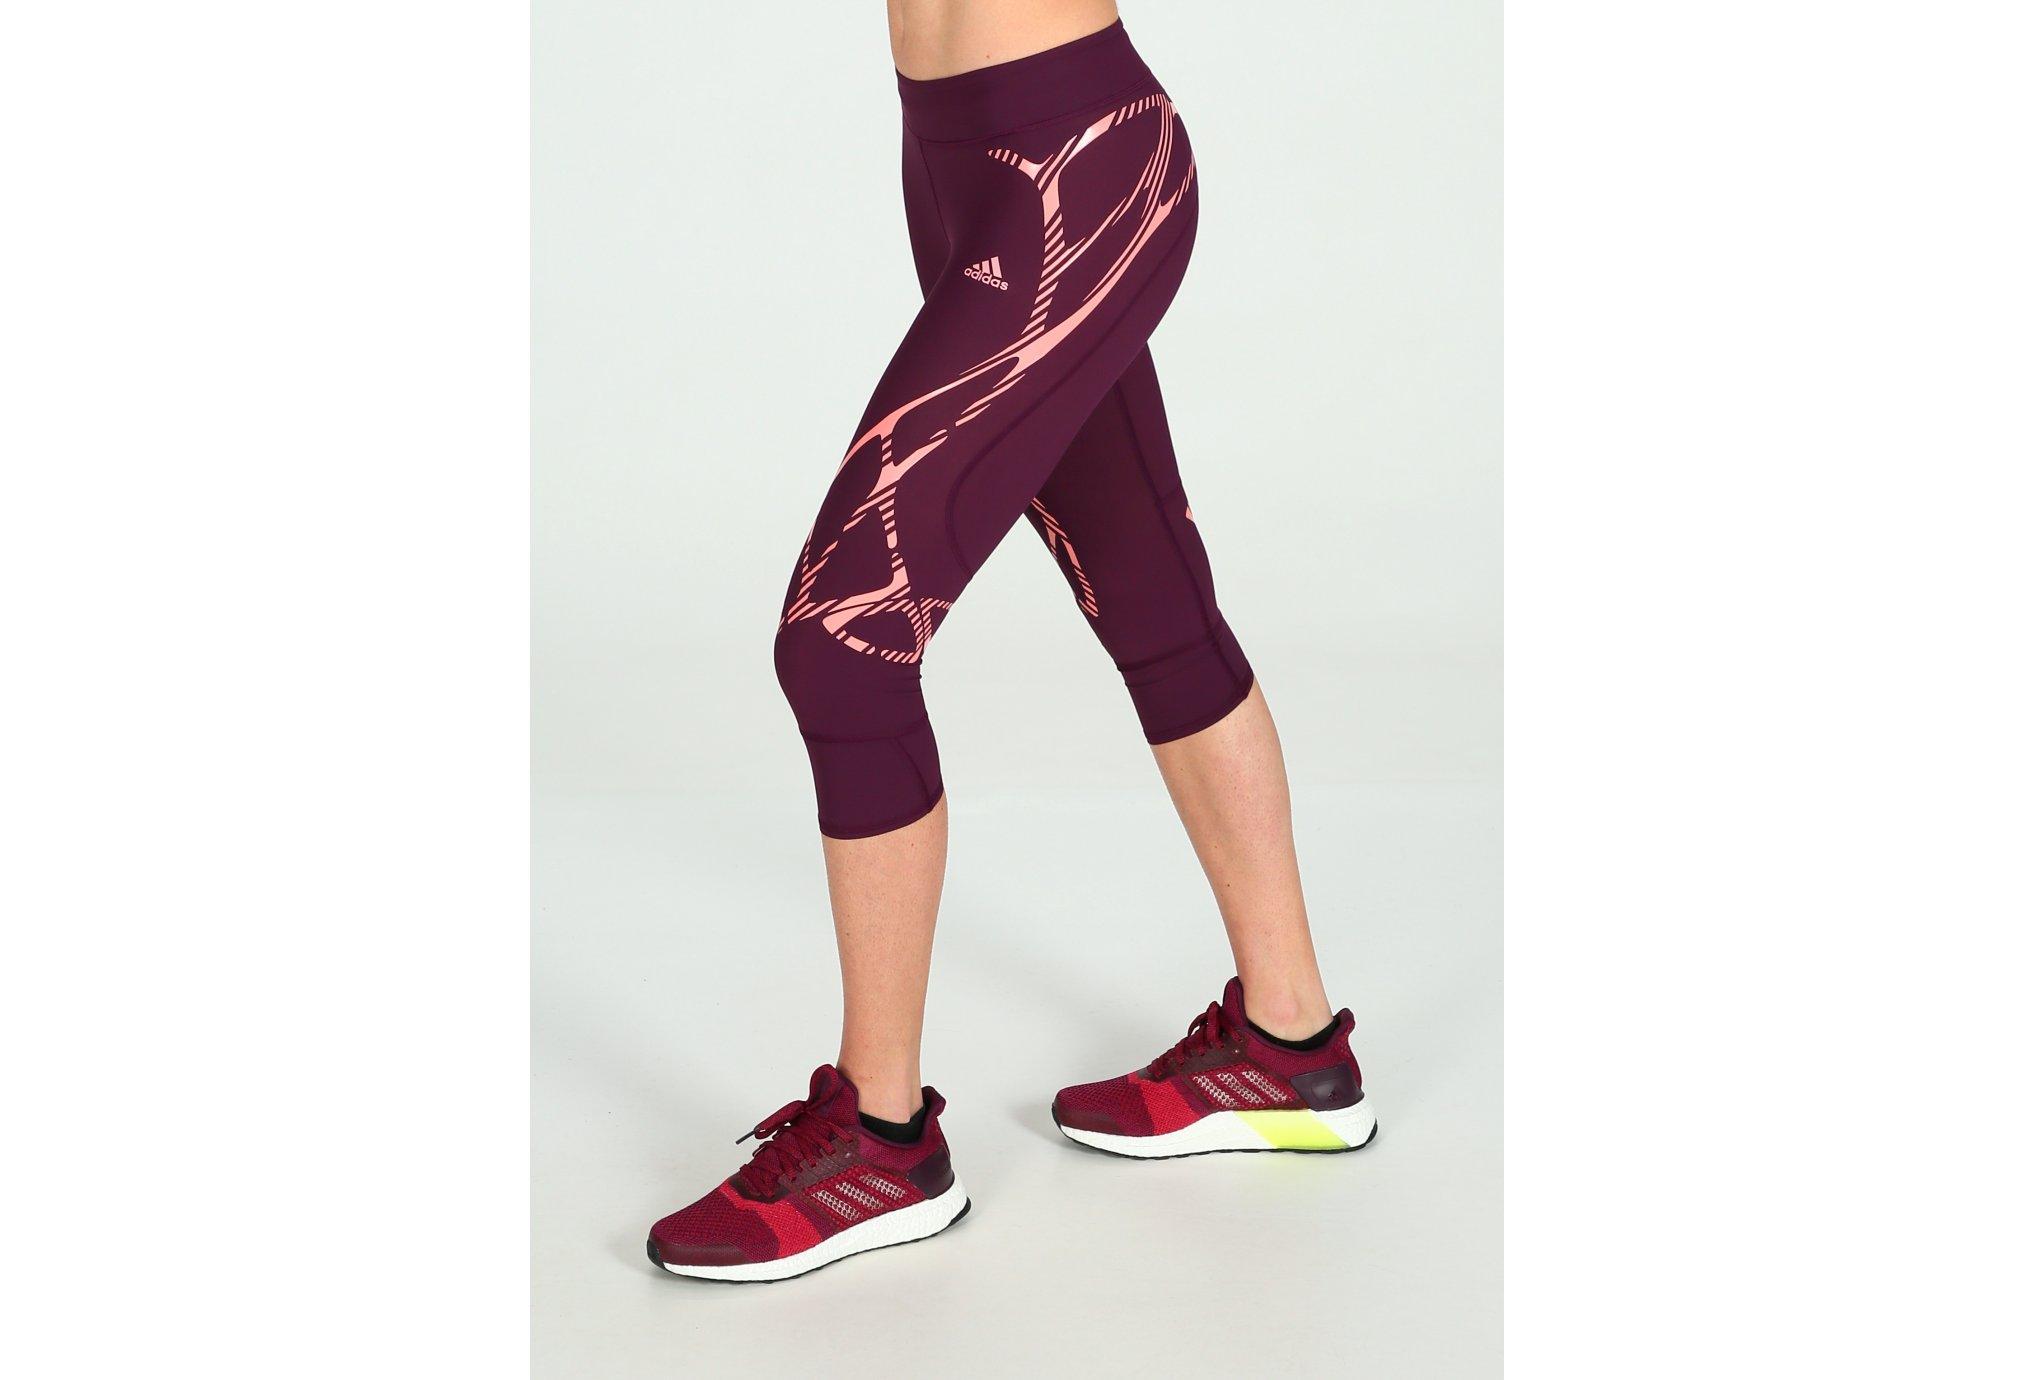 Adidas Tight 3/4 adizero sprintweb w vêtement running femme